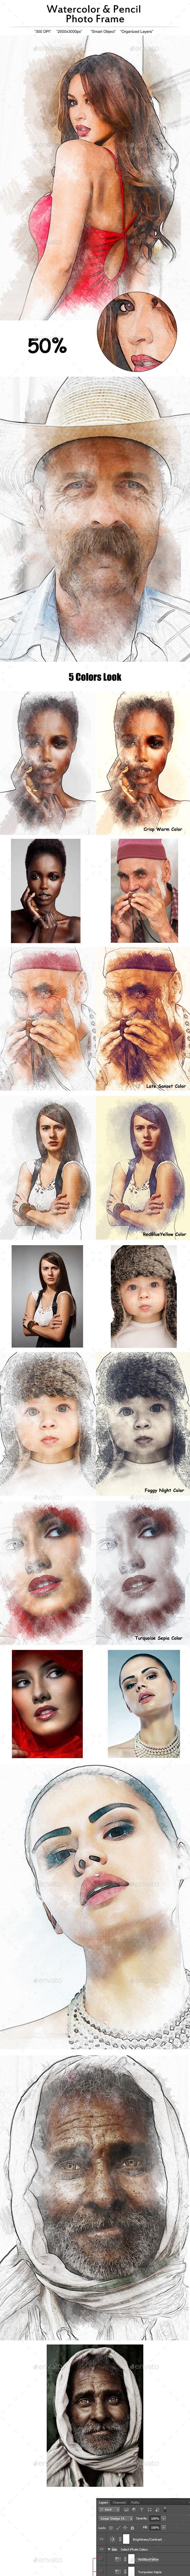 Artistic Photo Template  - Photo Templates Graphics